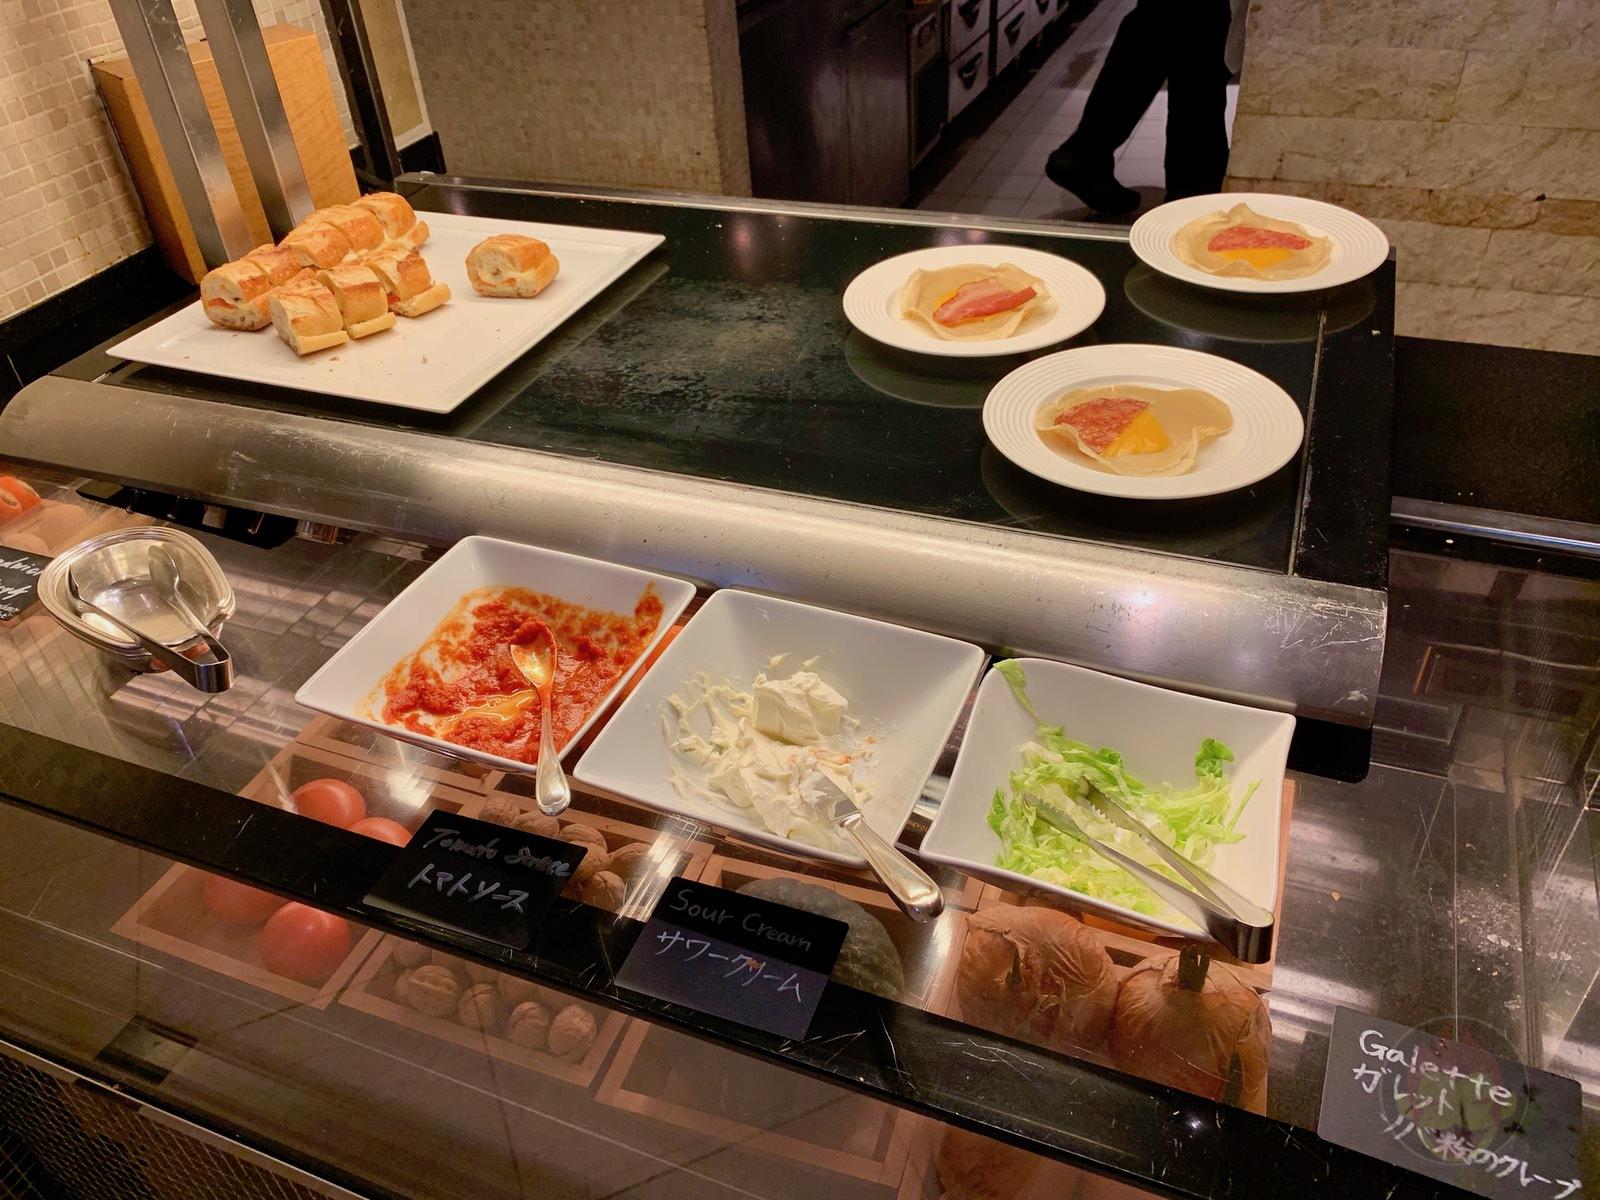 Westin tokyo theterrace lunch buffet 13